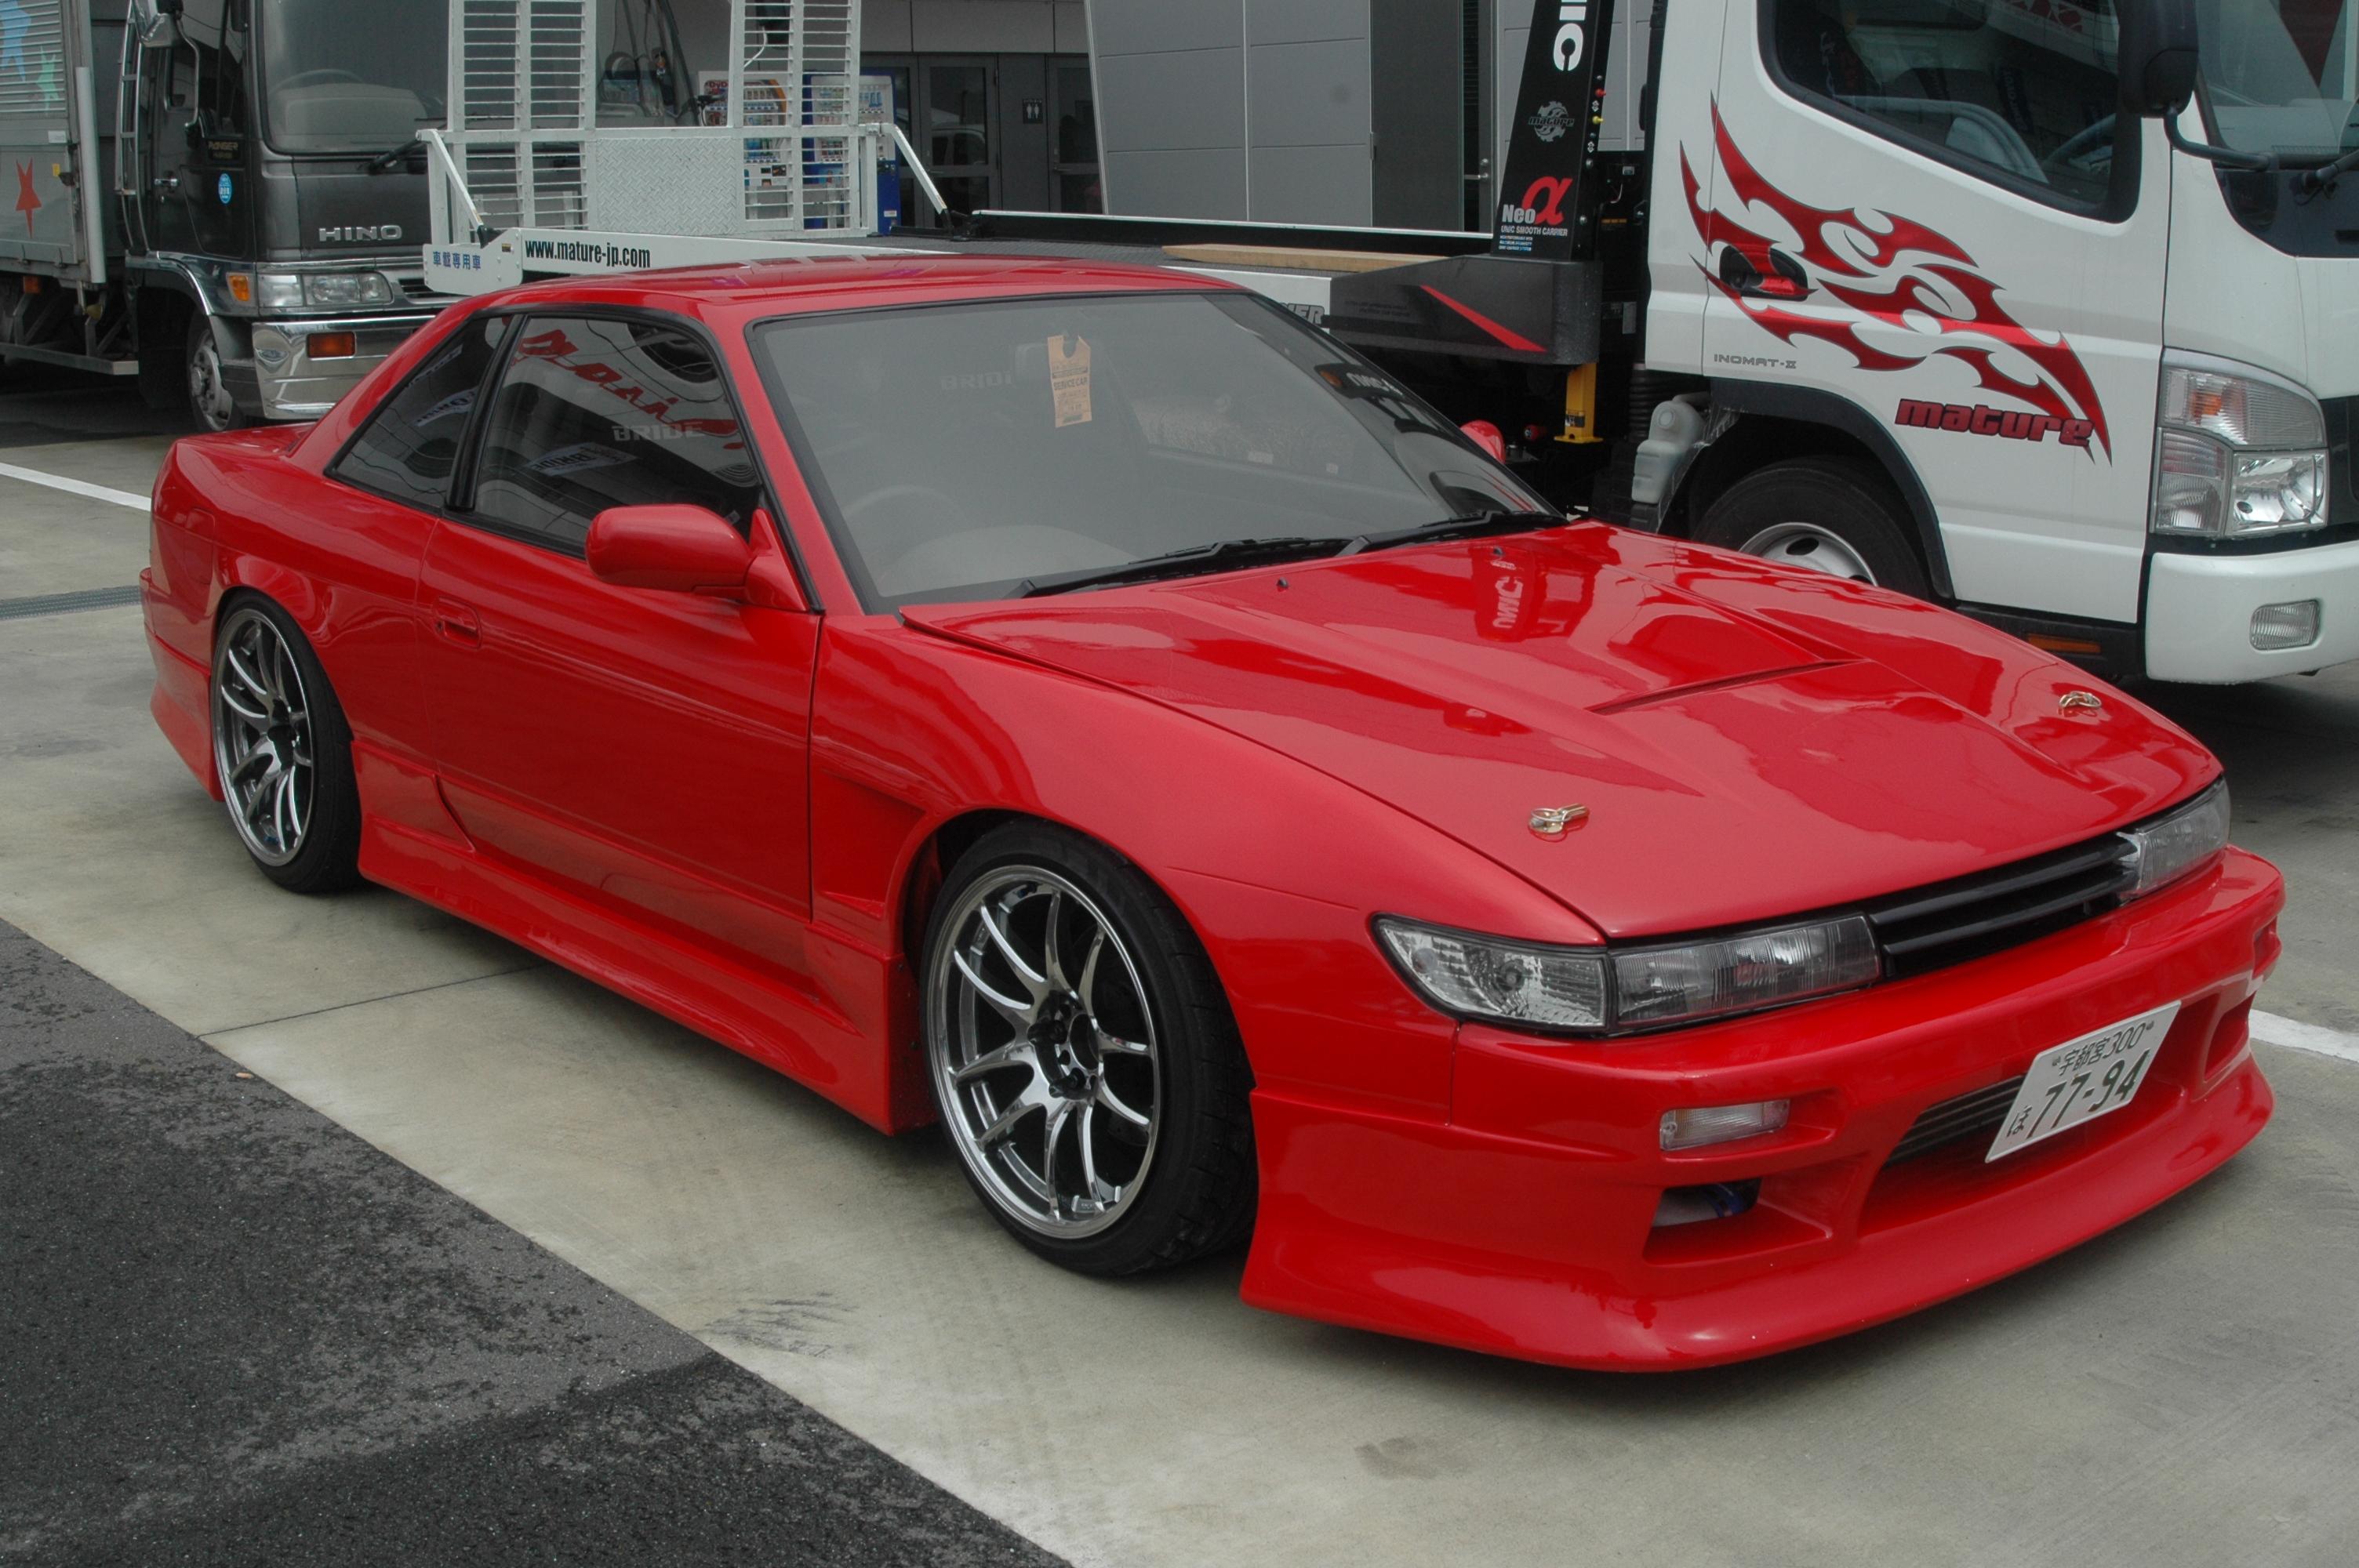 Best Looking S13s Ever V20 Nissan Forum Forums Remote Start Help Image